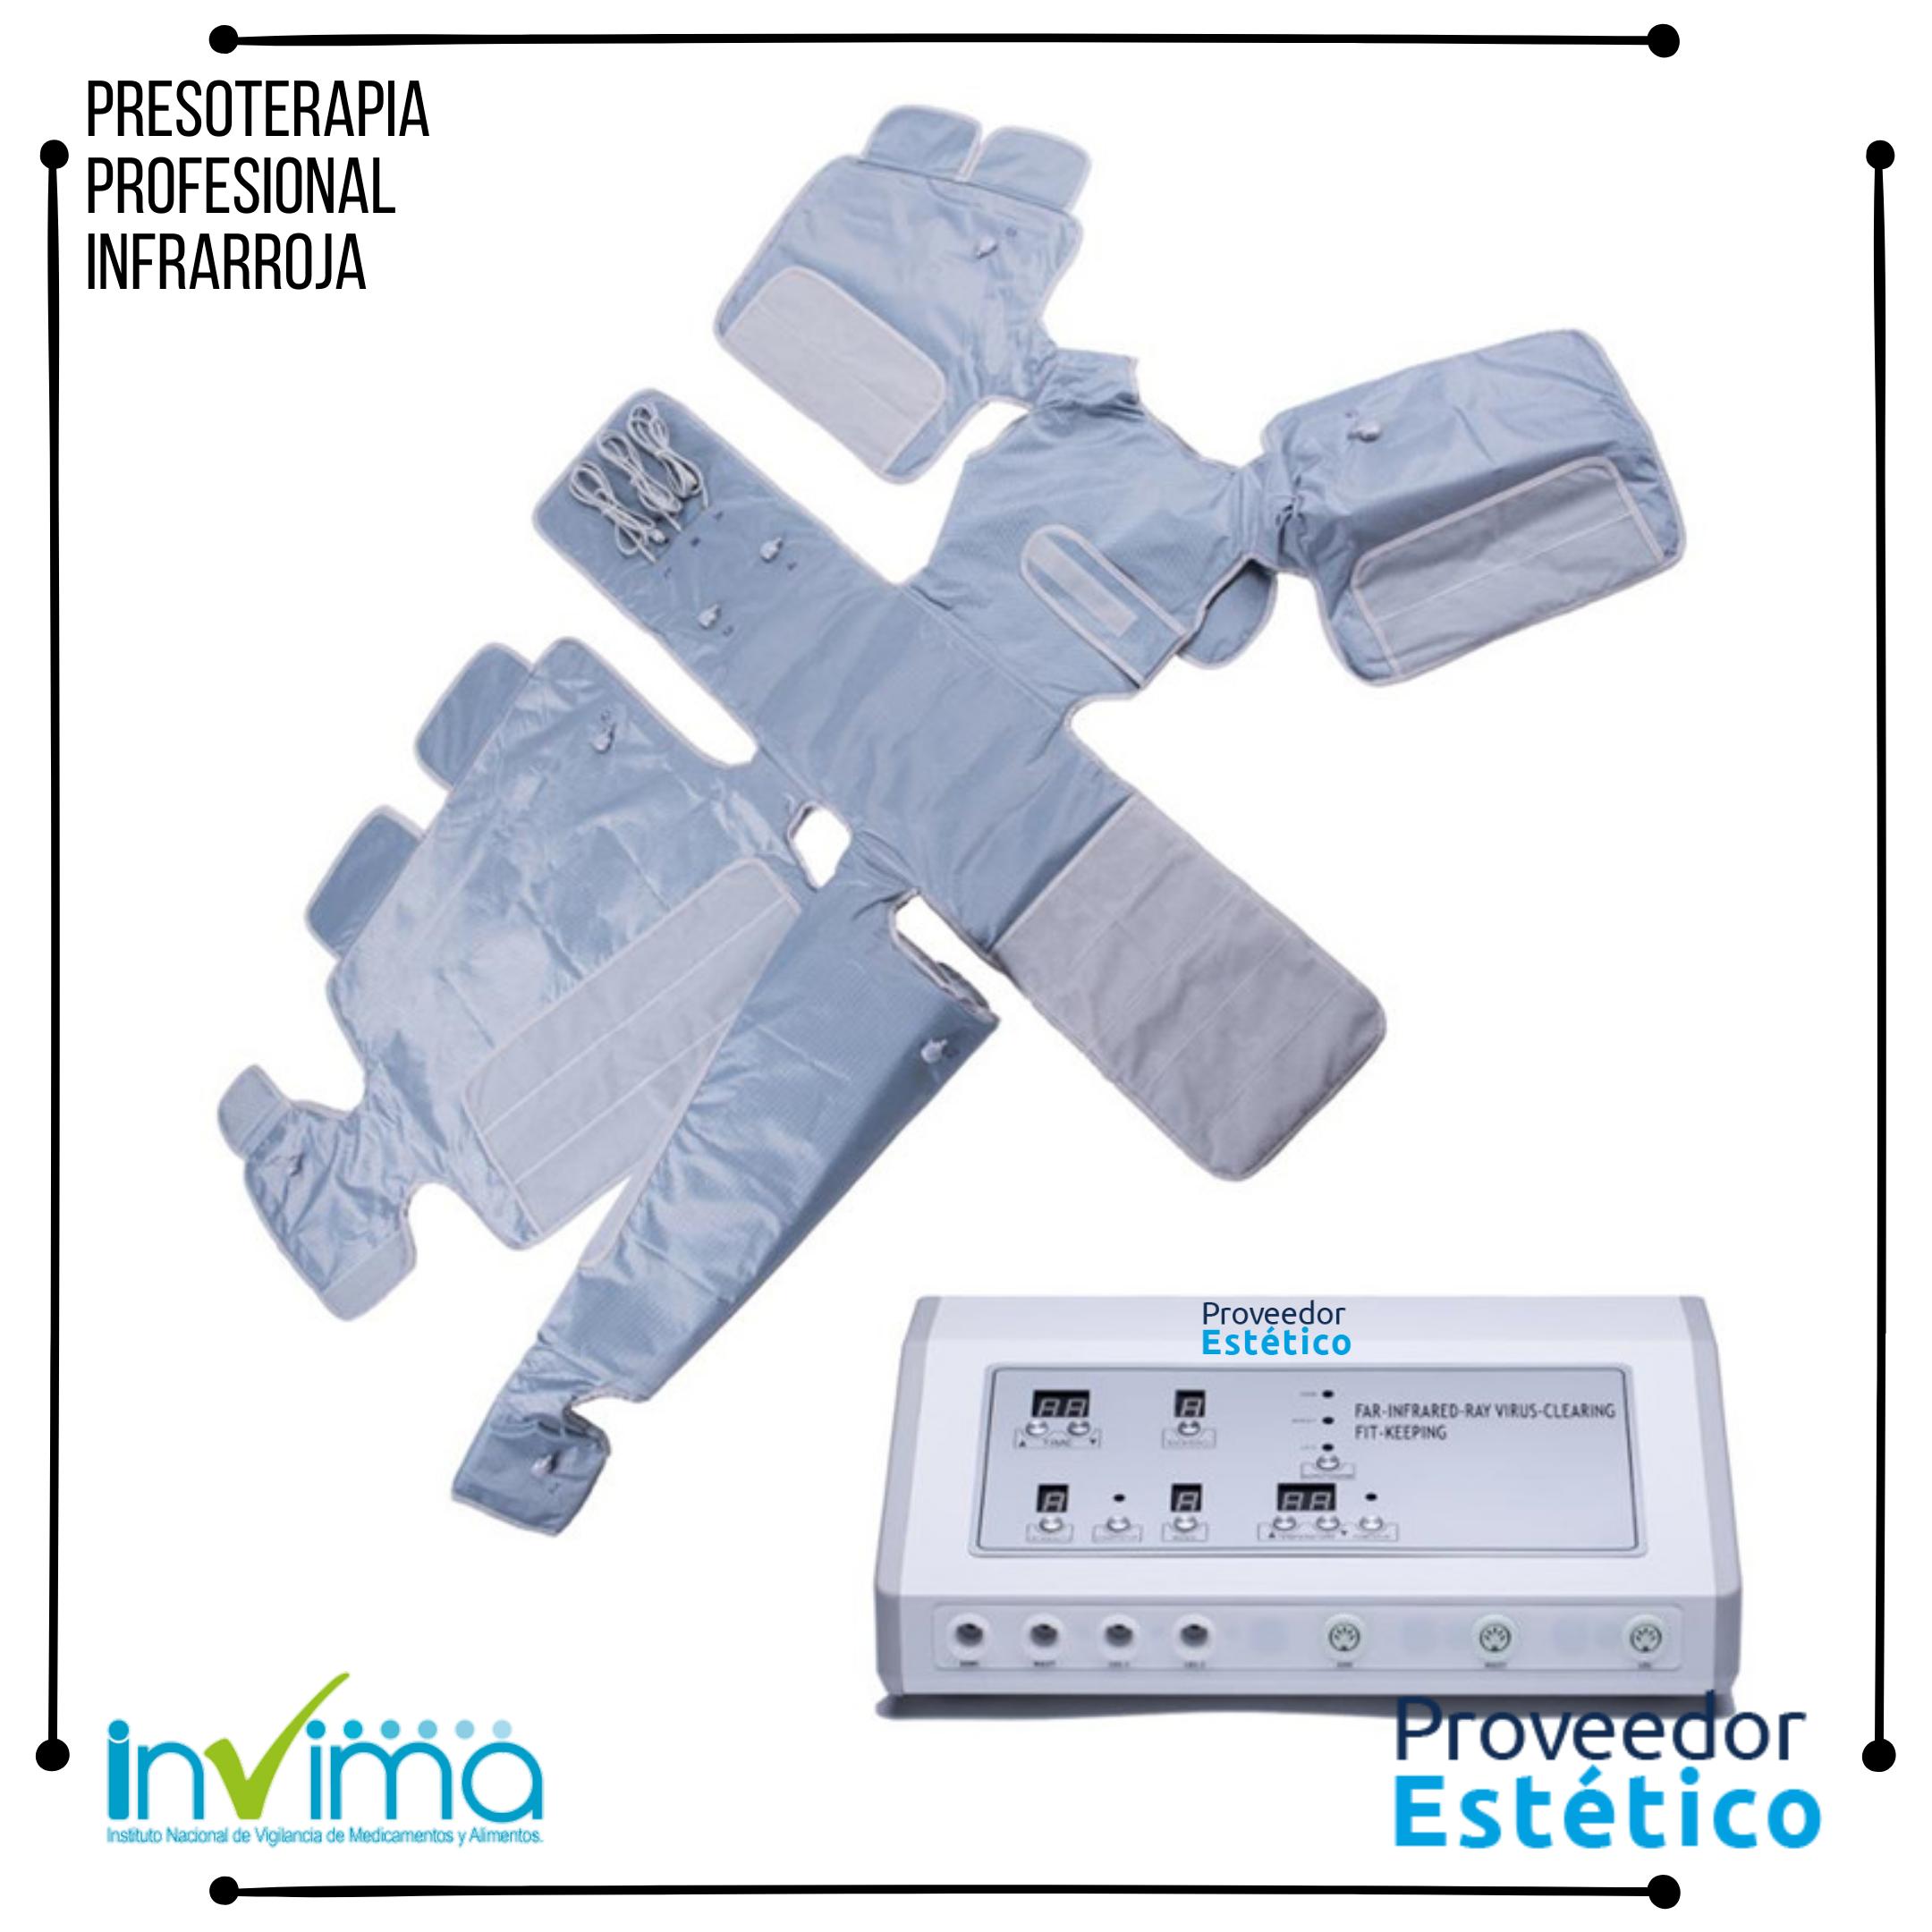 https://0201.nccdn.net/1_2/000/000/105/16c/presoterapia-infrarroja--1-.png